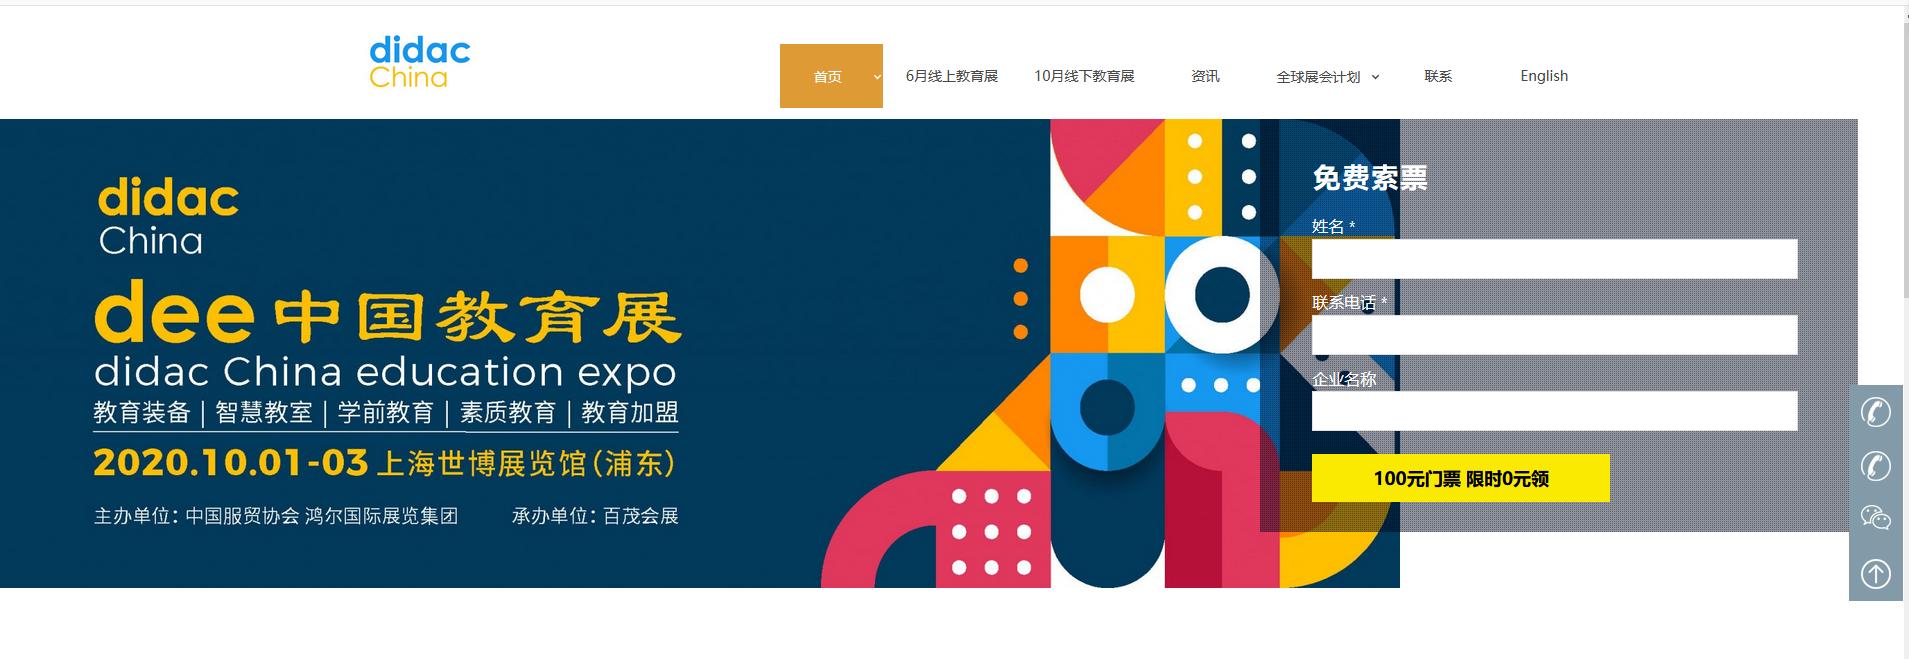 didac上海国际教育加盟连锁展